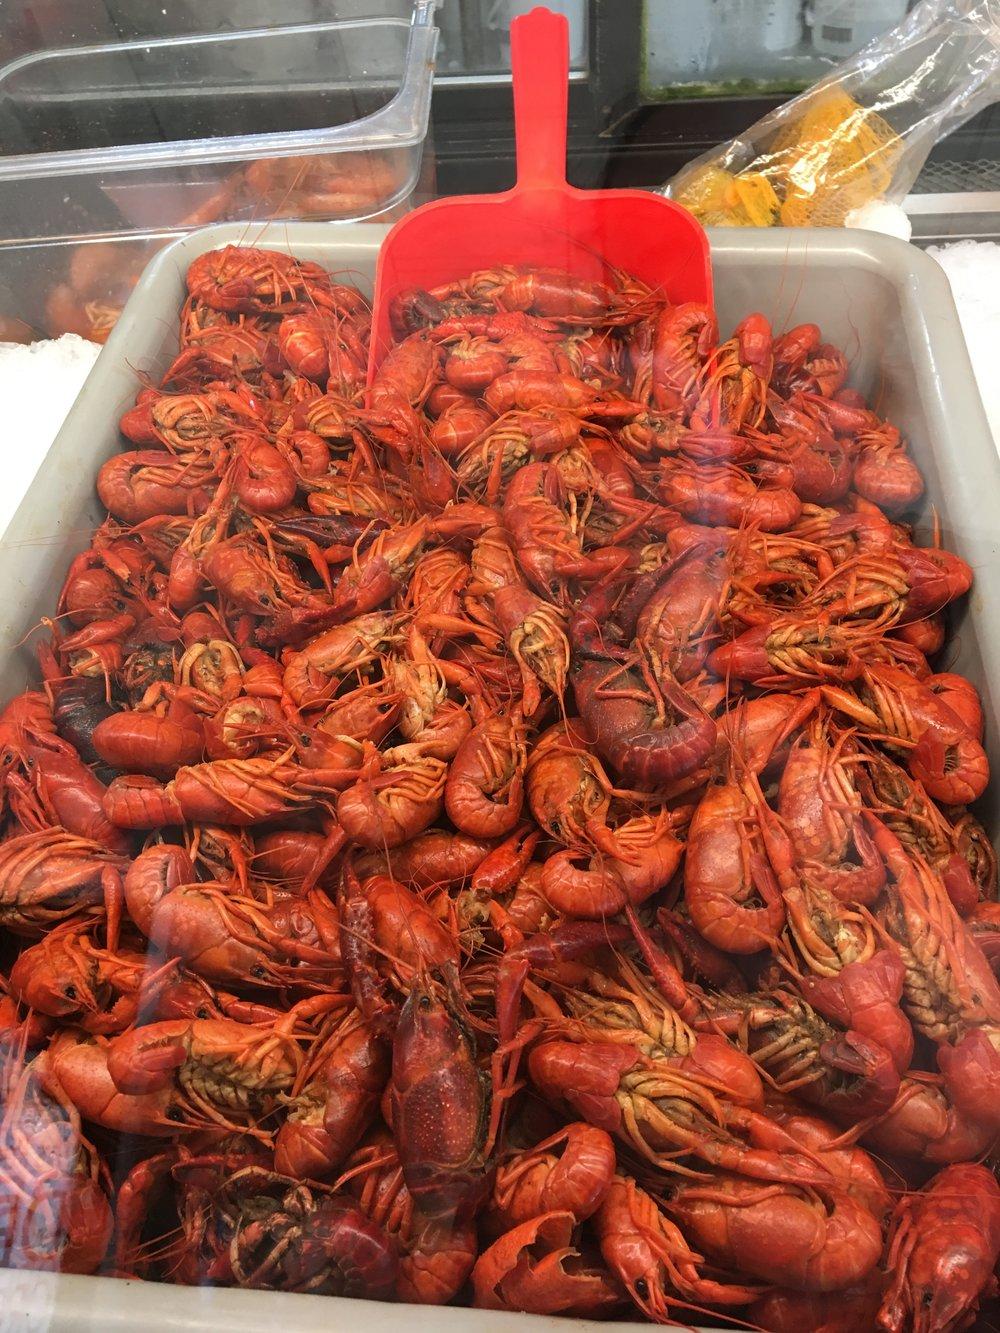 Crawfish in Louisiana.JPG